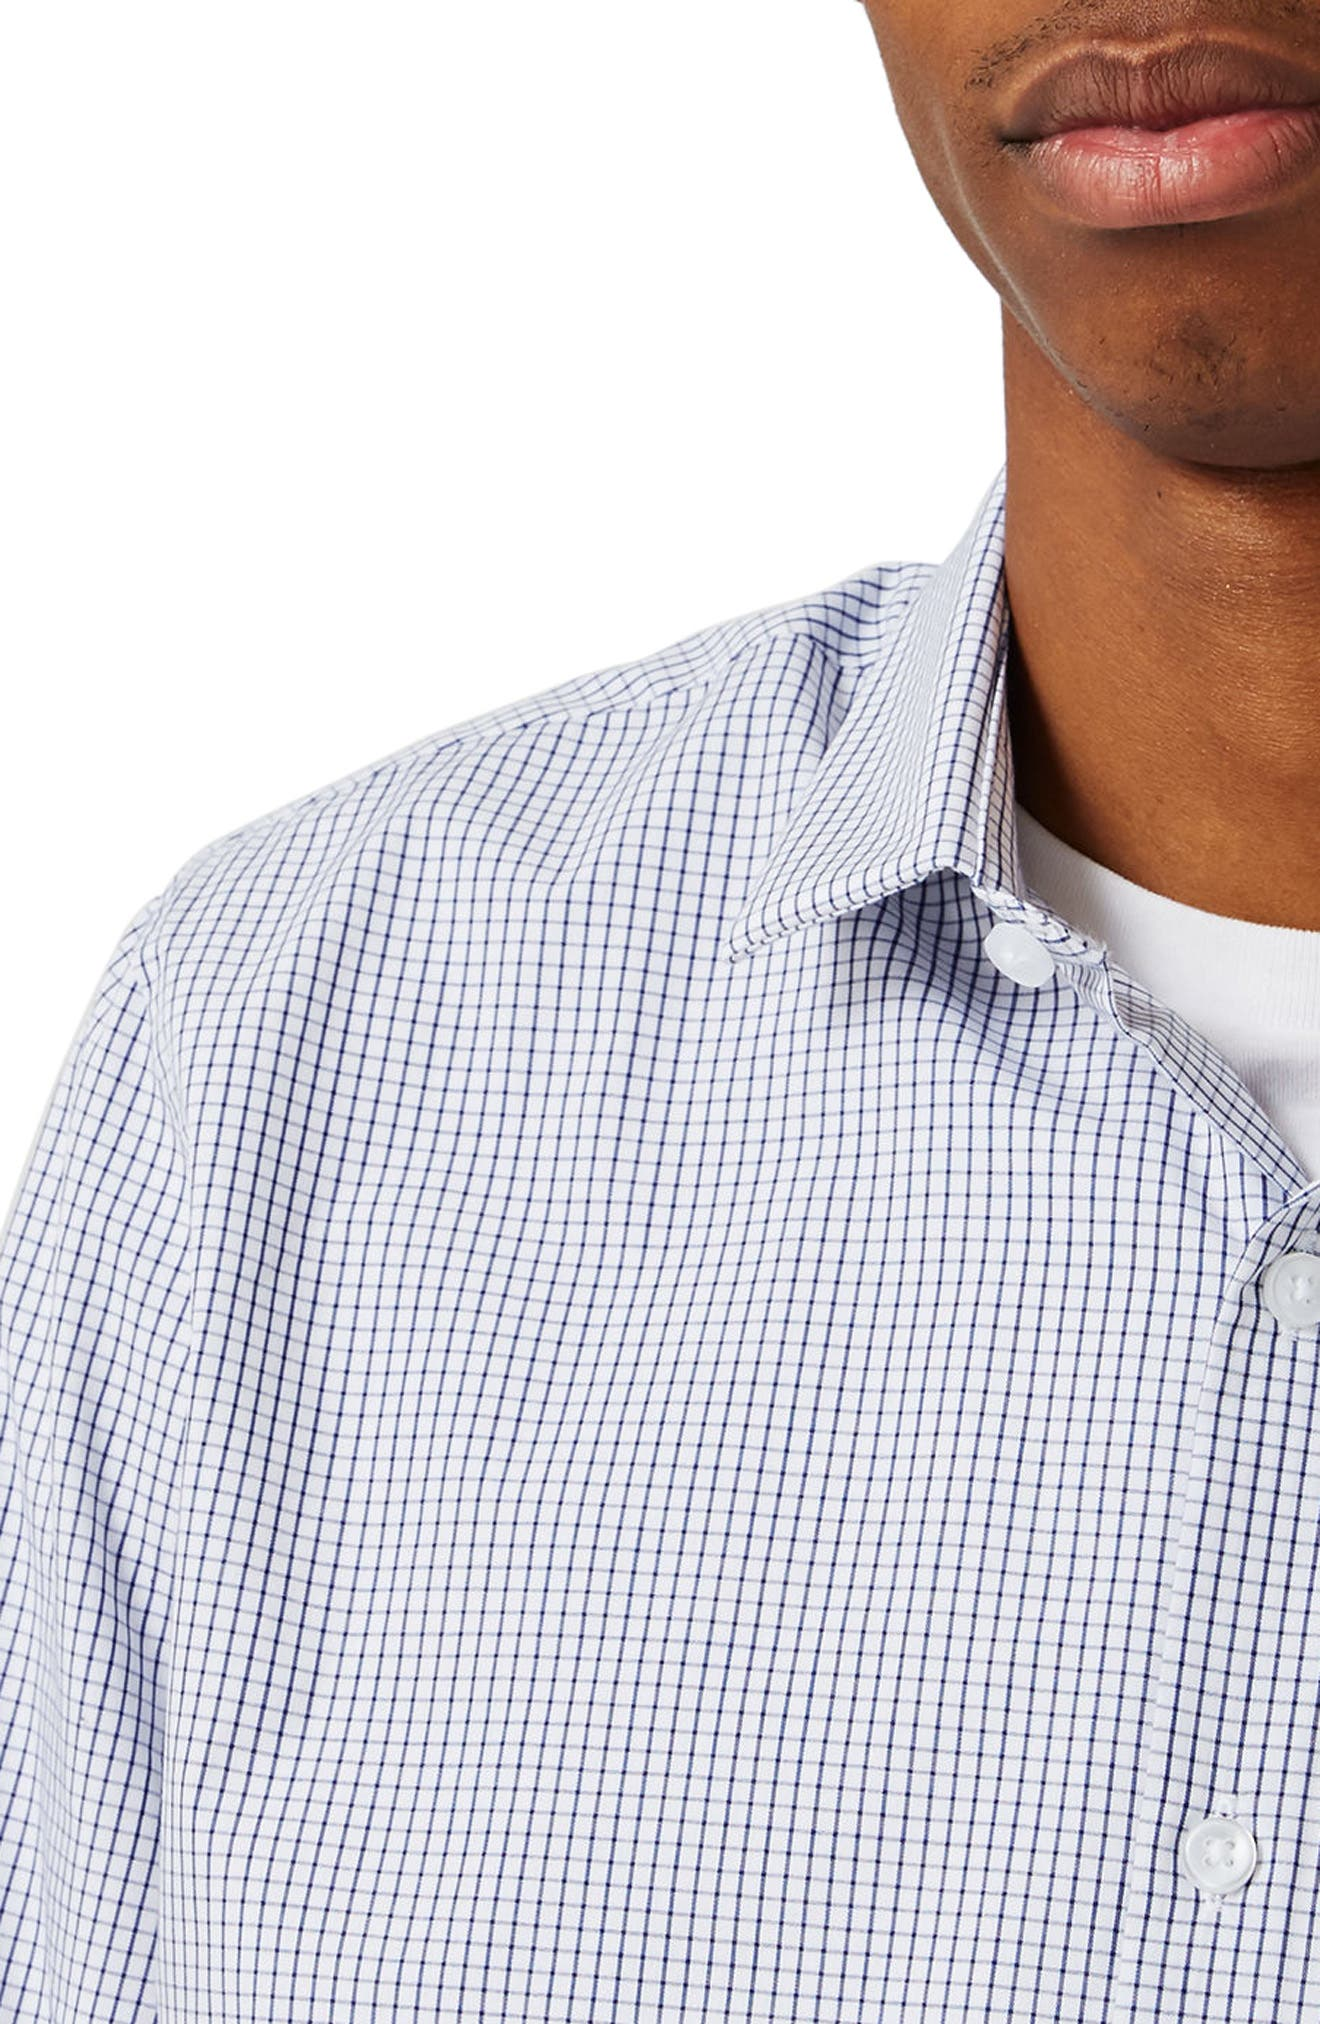 Slim Fit Grid Check Dress Shirt,                             Alternate thumbnail 2, color,                             102